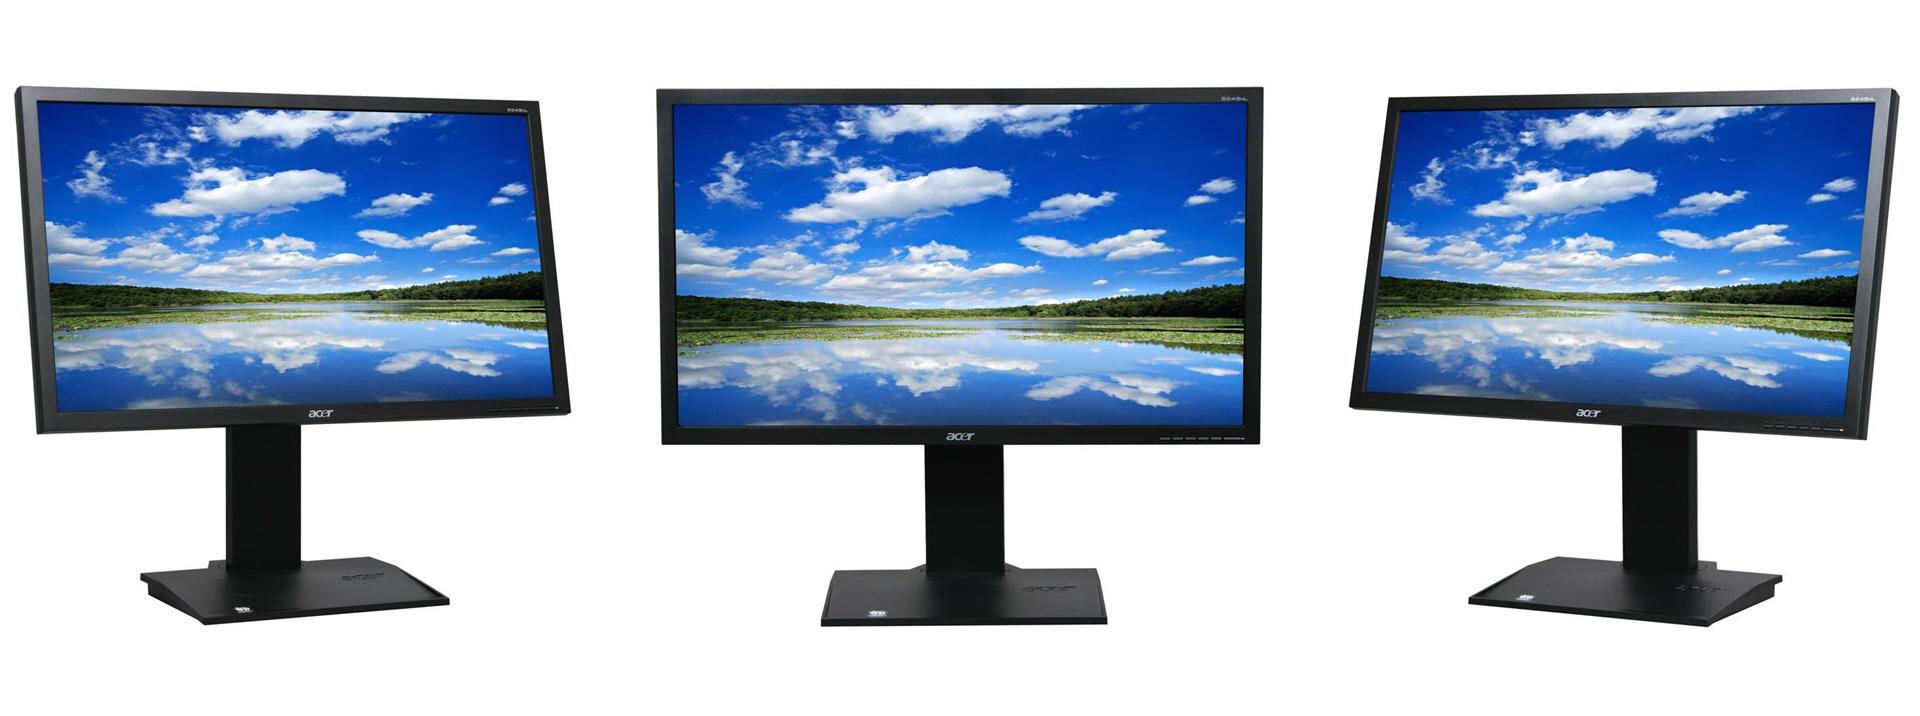 Acer B243HL رایان استار